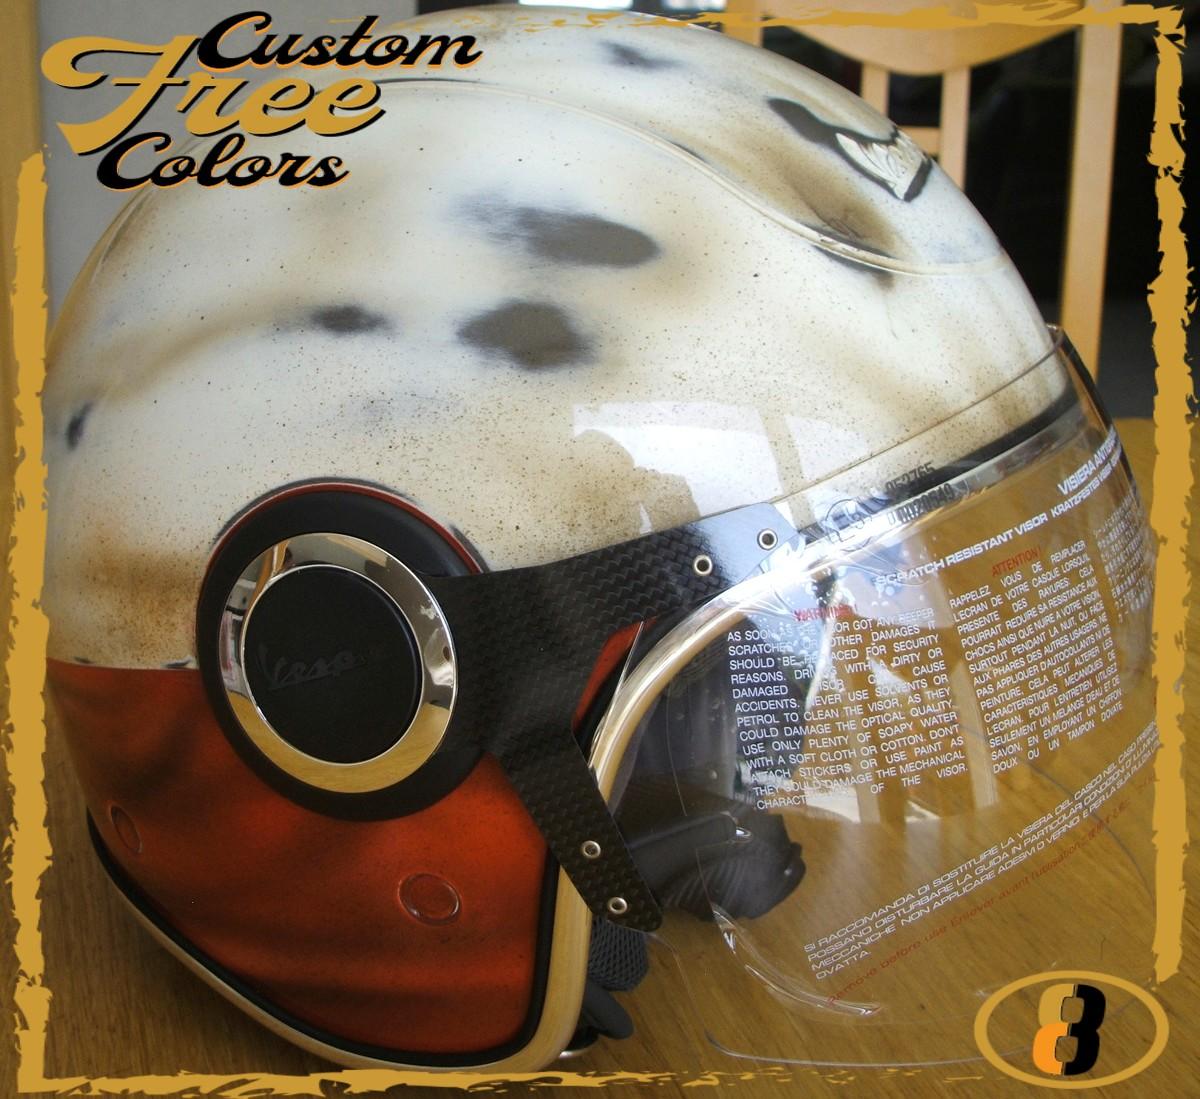 peinture personnalisee aerographe custom3colors moto harley davidson